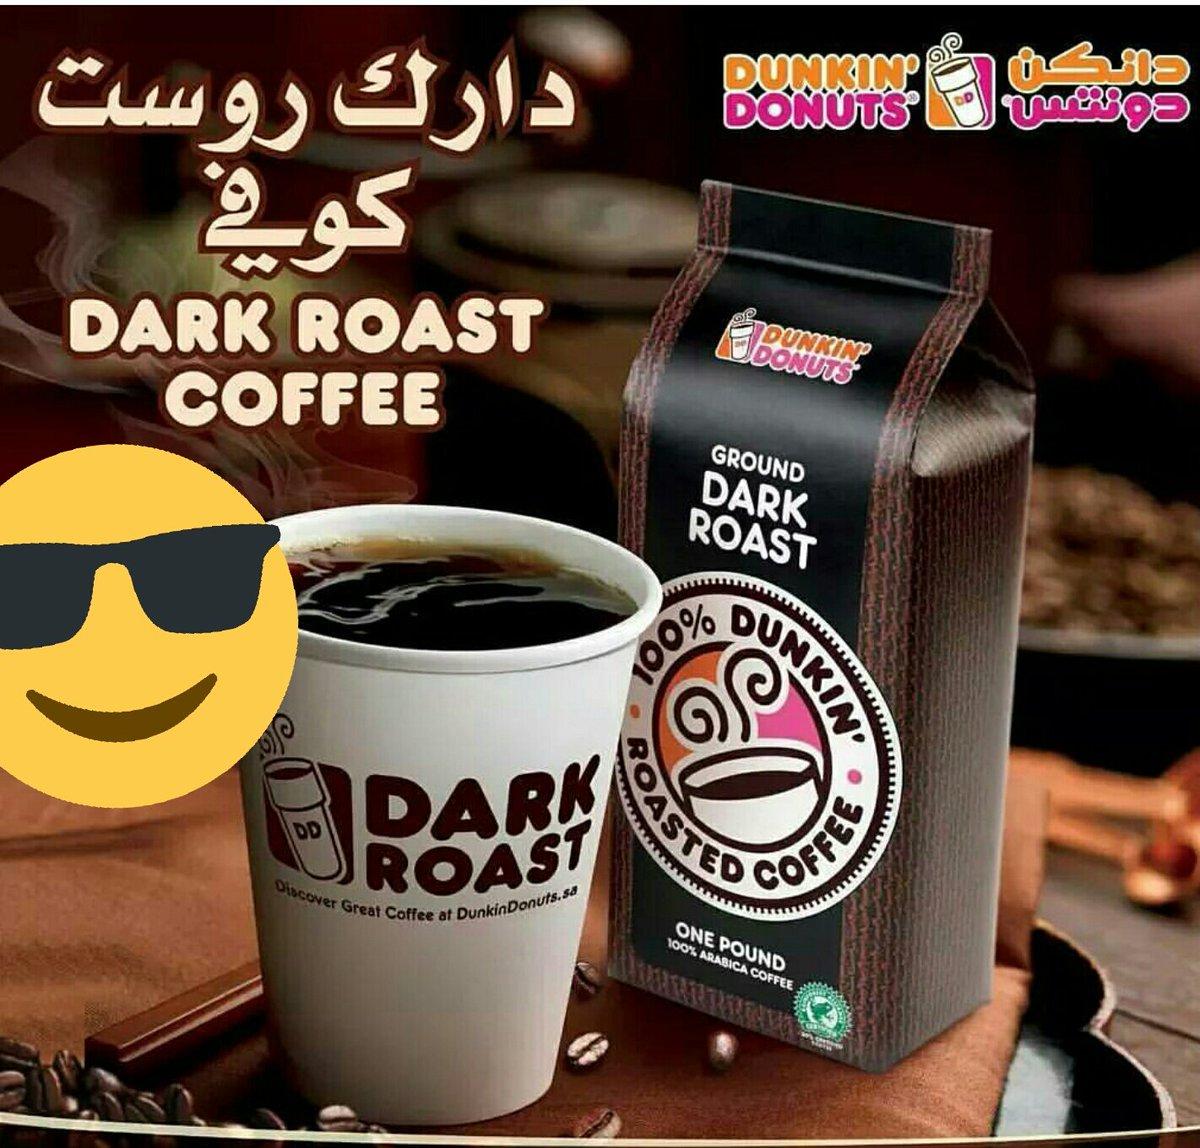 O Xrhsths دانكن السعودية Sto Twitter أفضل محارب للخمول قهوة دارك روست من دانكن دونتس